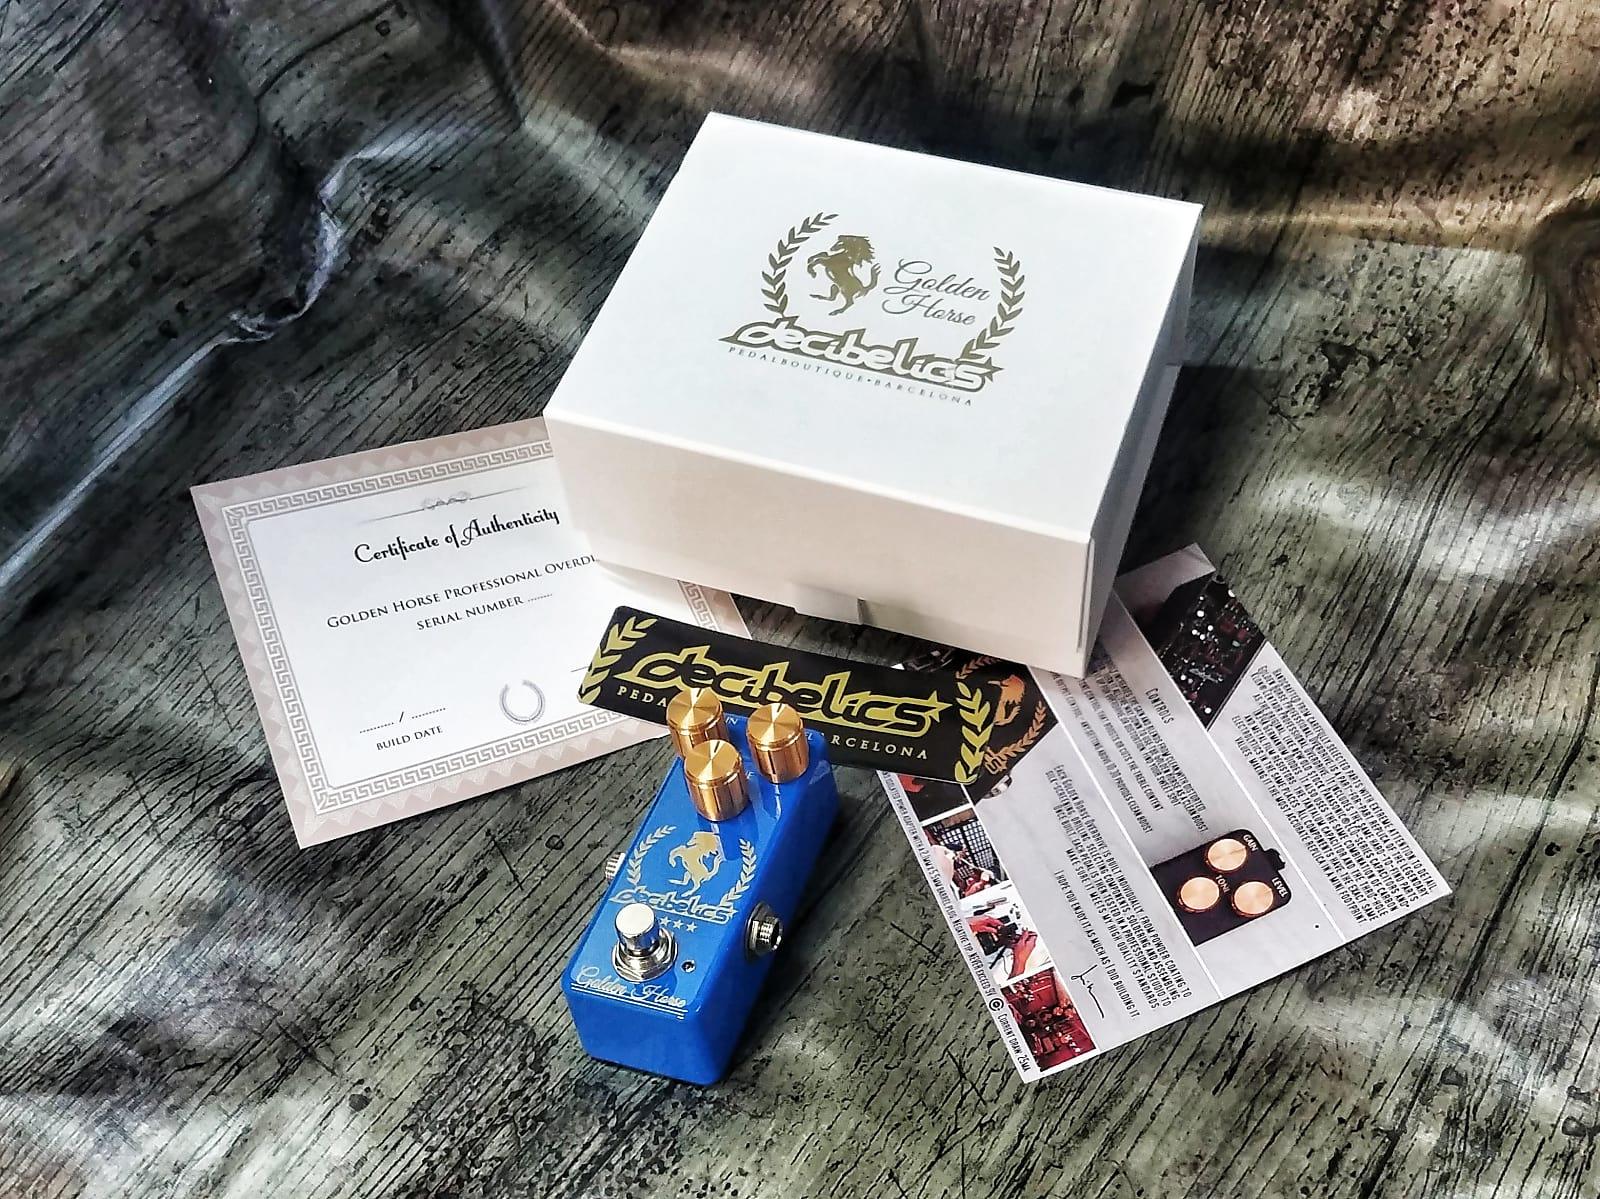 Decibelics Golden Horse Professional Overdrive - Azure Blue  Edition - May Preorder